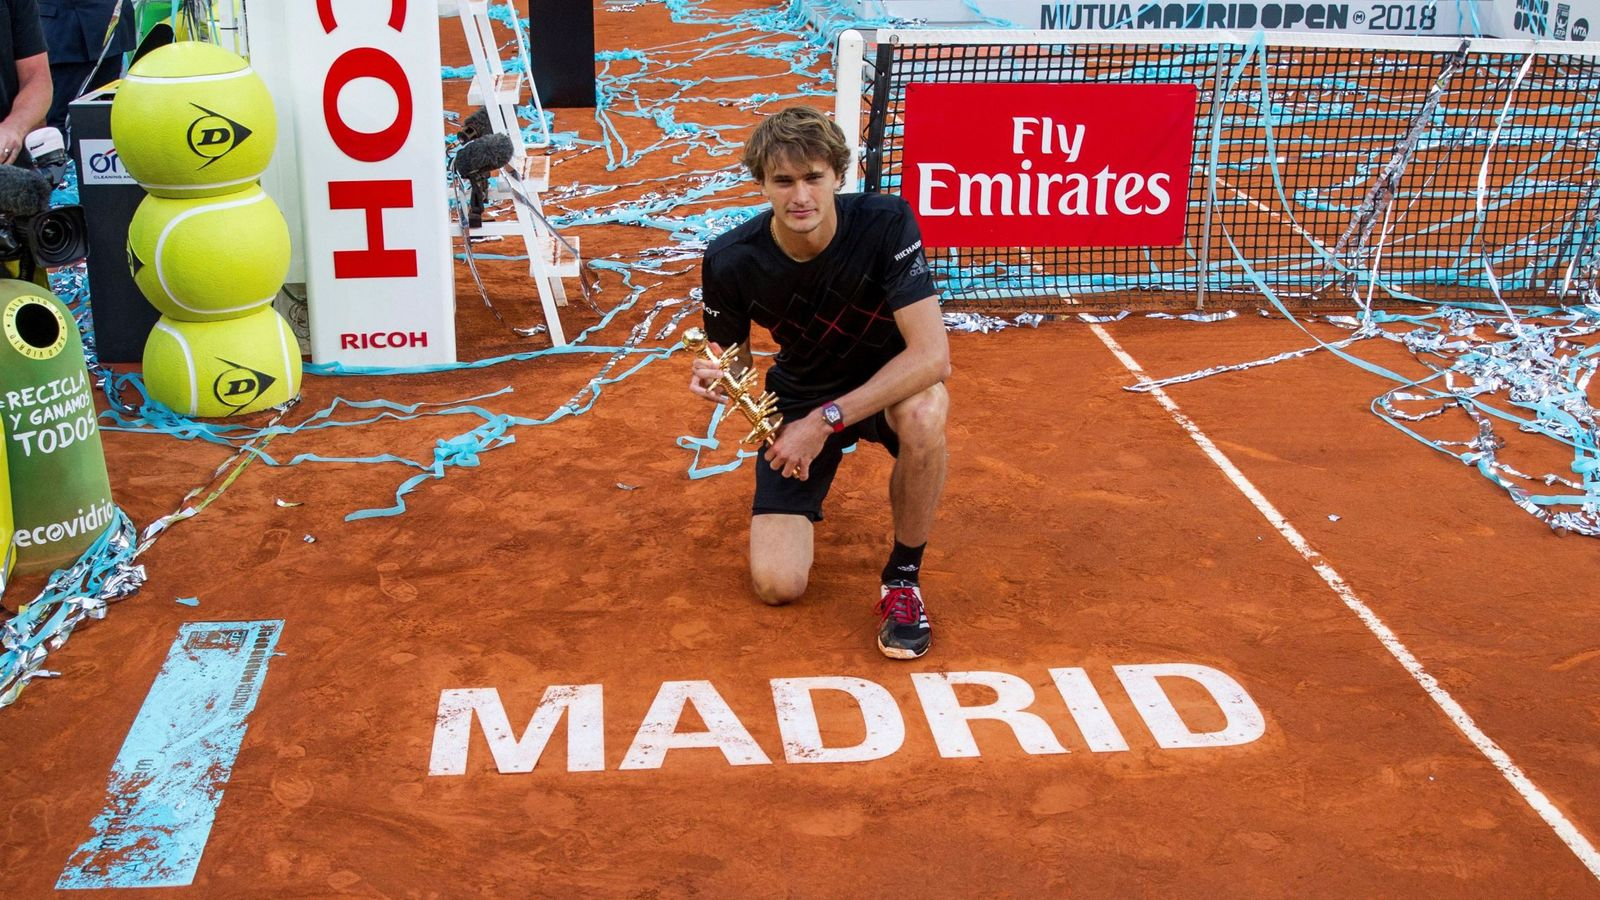 Foto: Zverev, campeón en Madrid. (EFE)